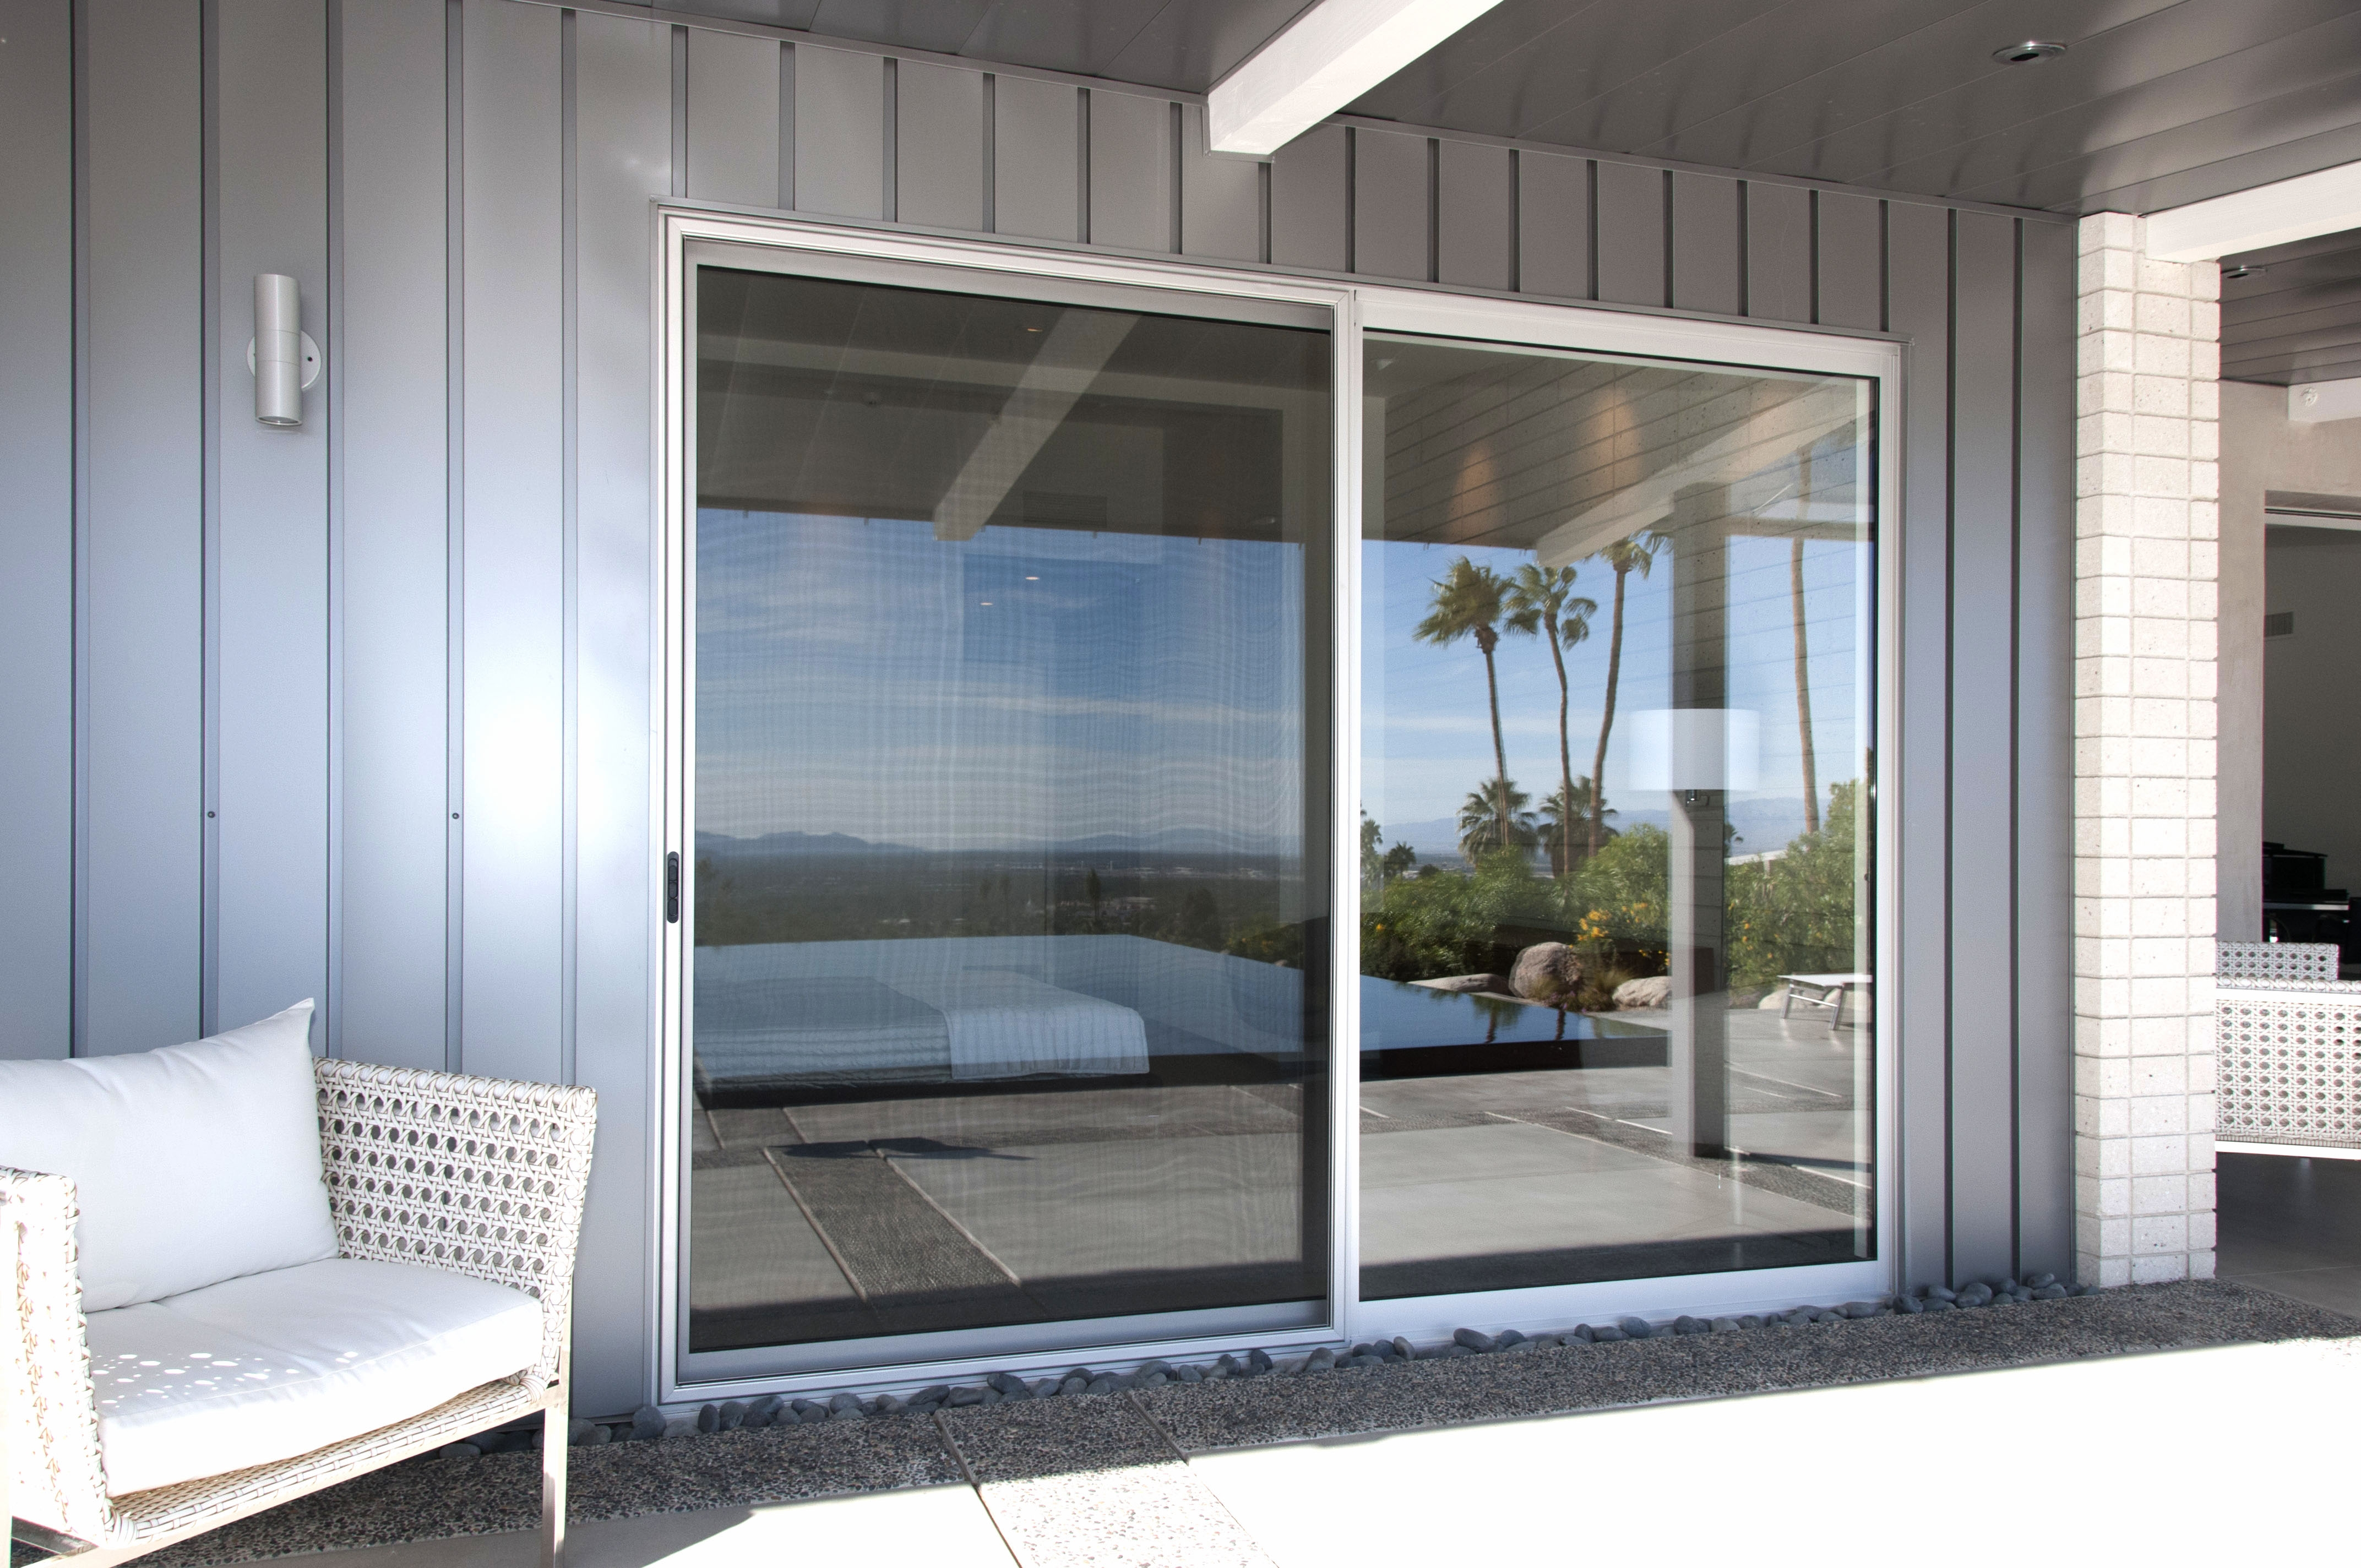 Repairing Sliding Glass Doorssliding glass door repair company i62 all about stunning home